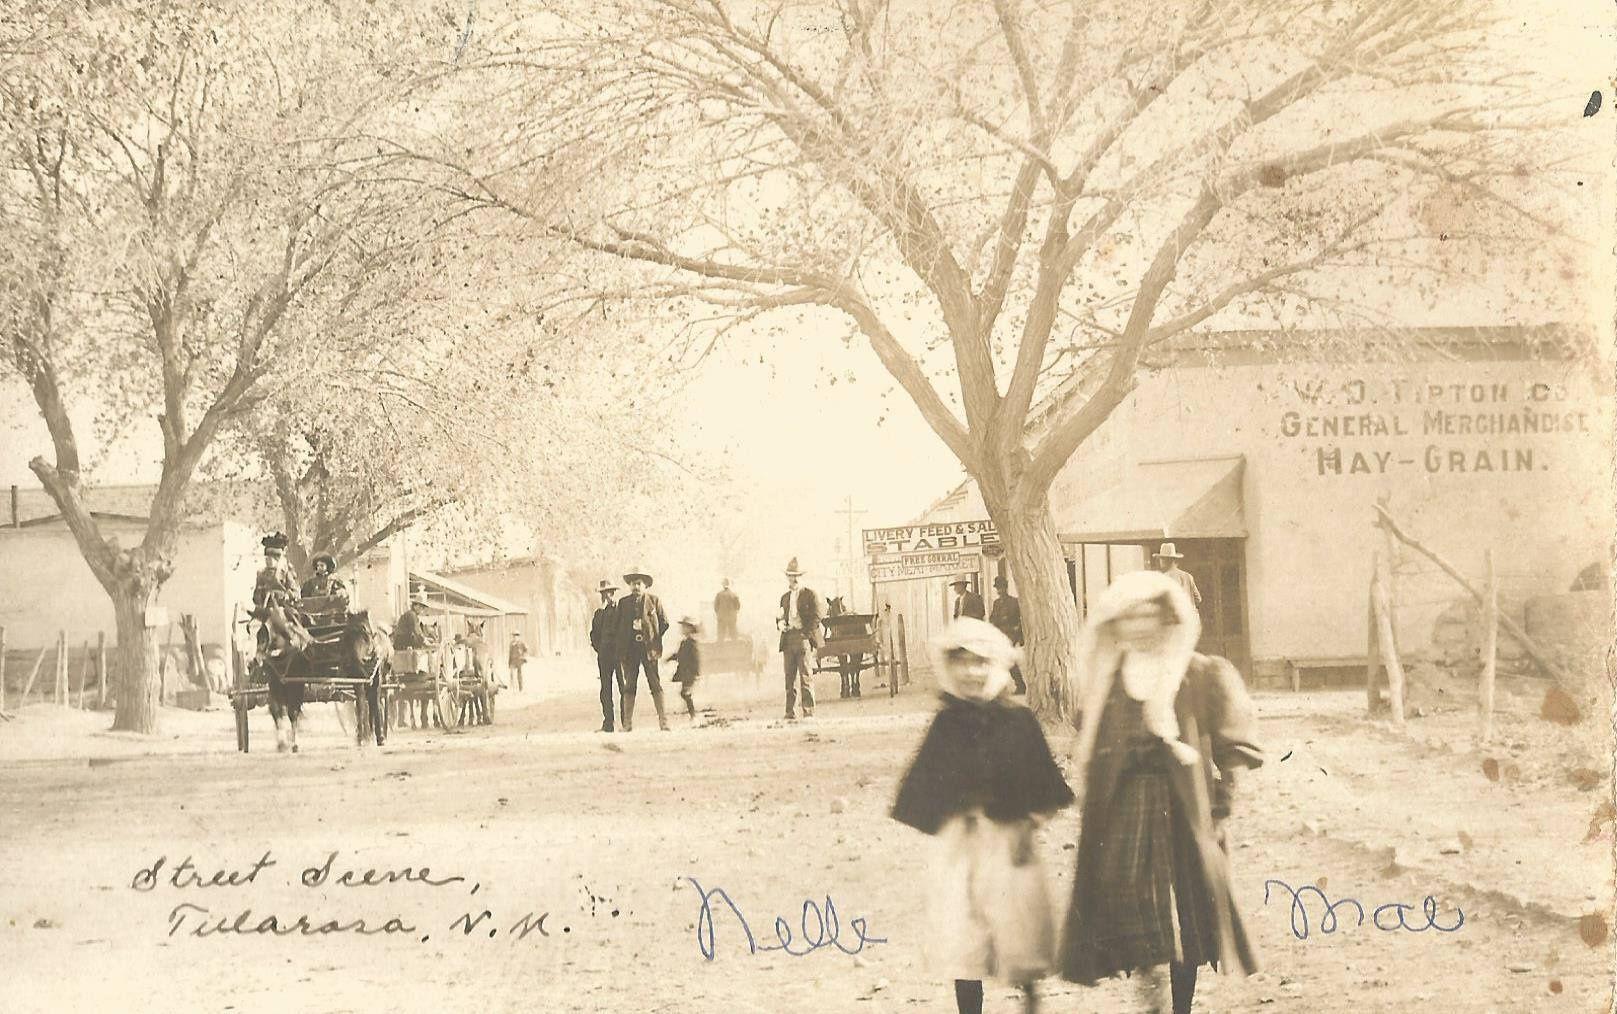 WD Tipton Company on Granado Street.